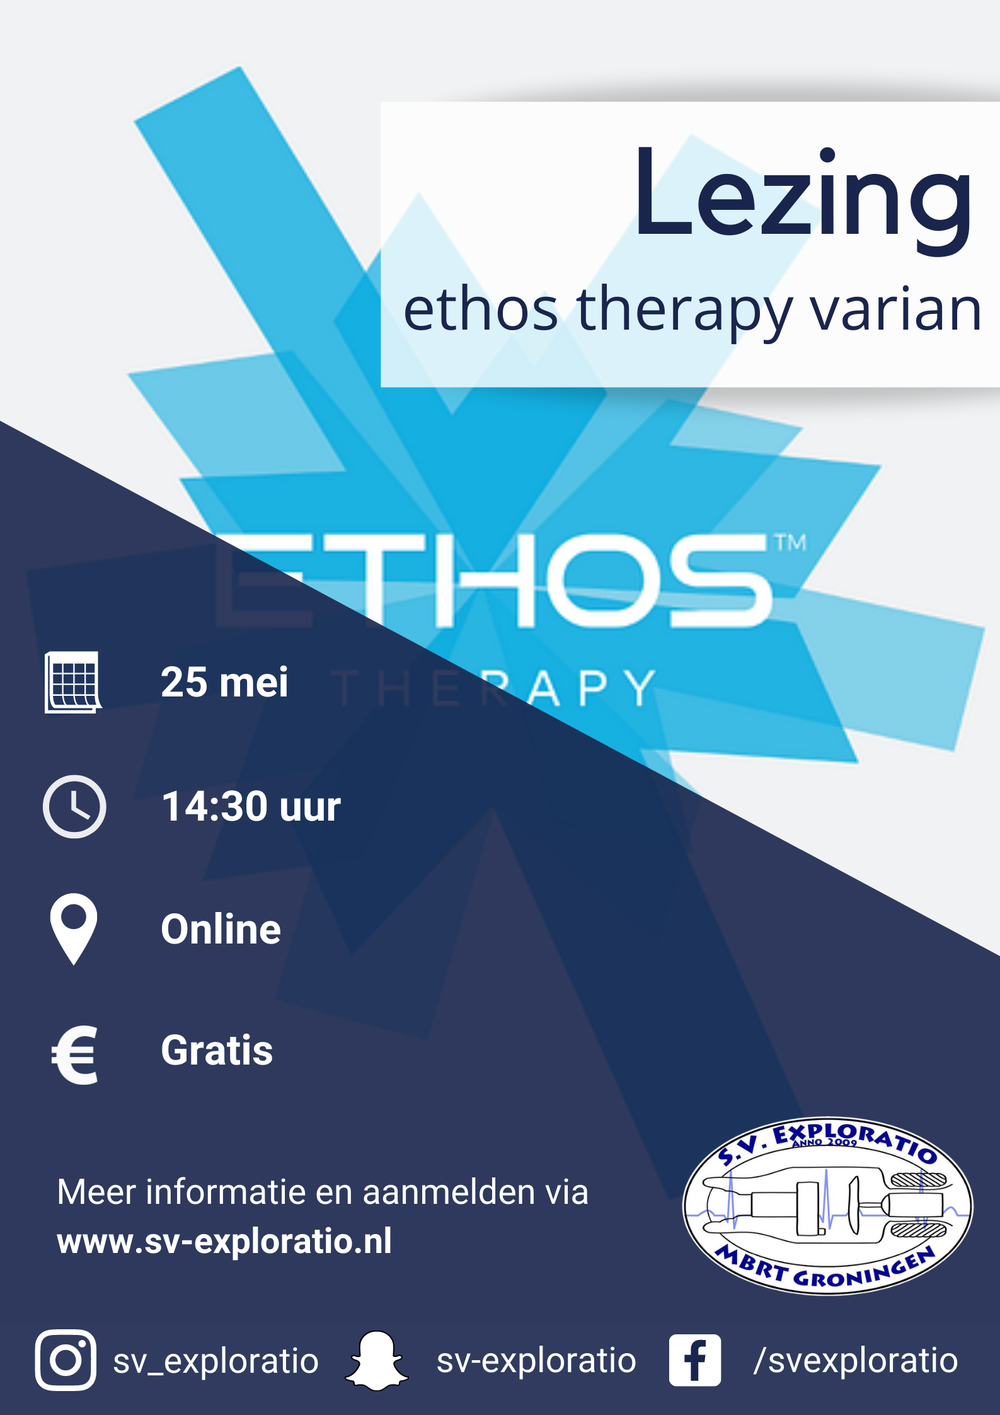 Lezing: Ethos therapy varian